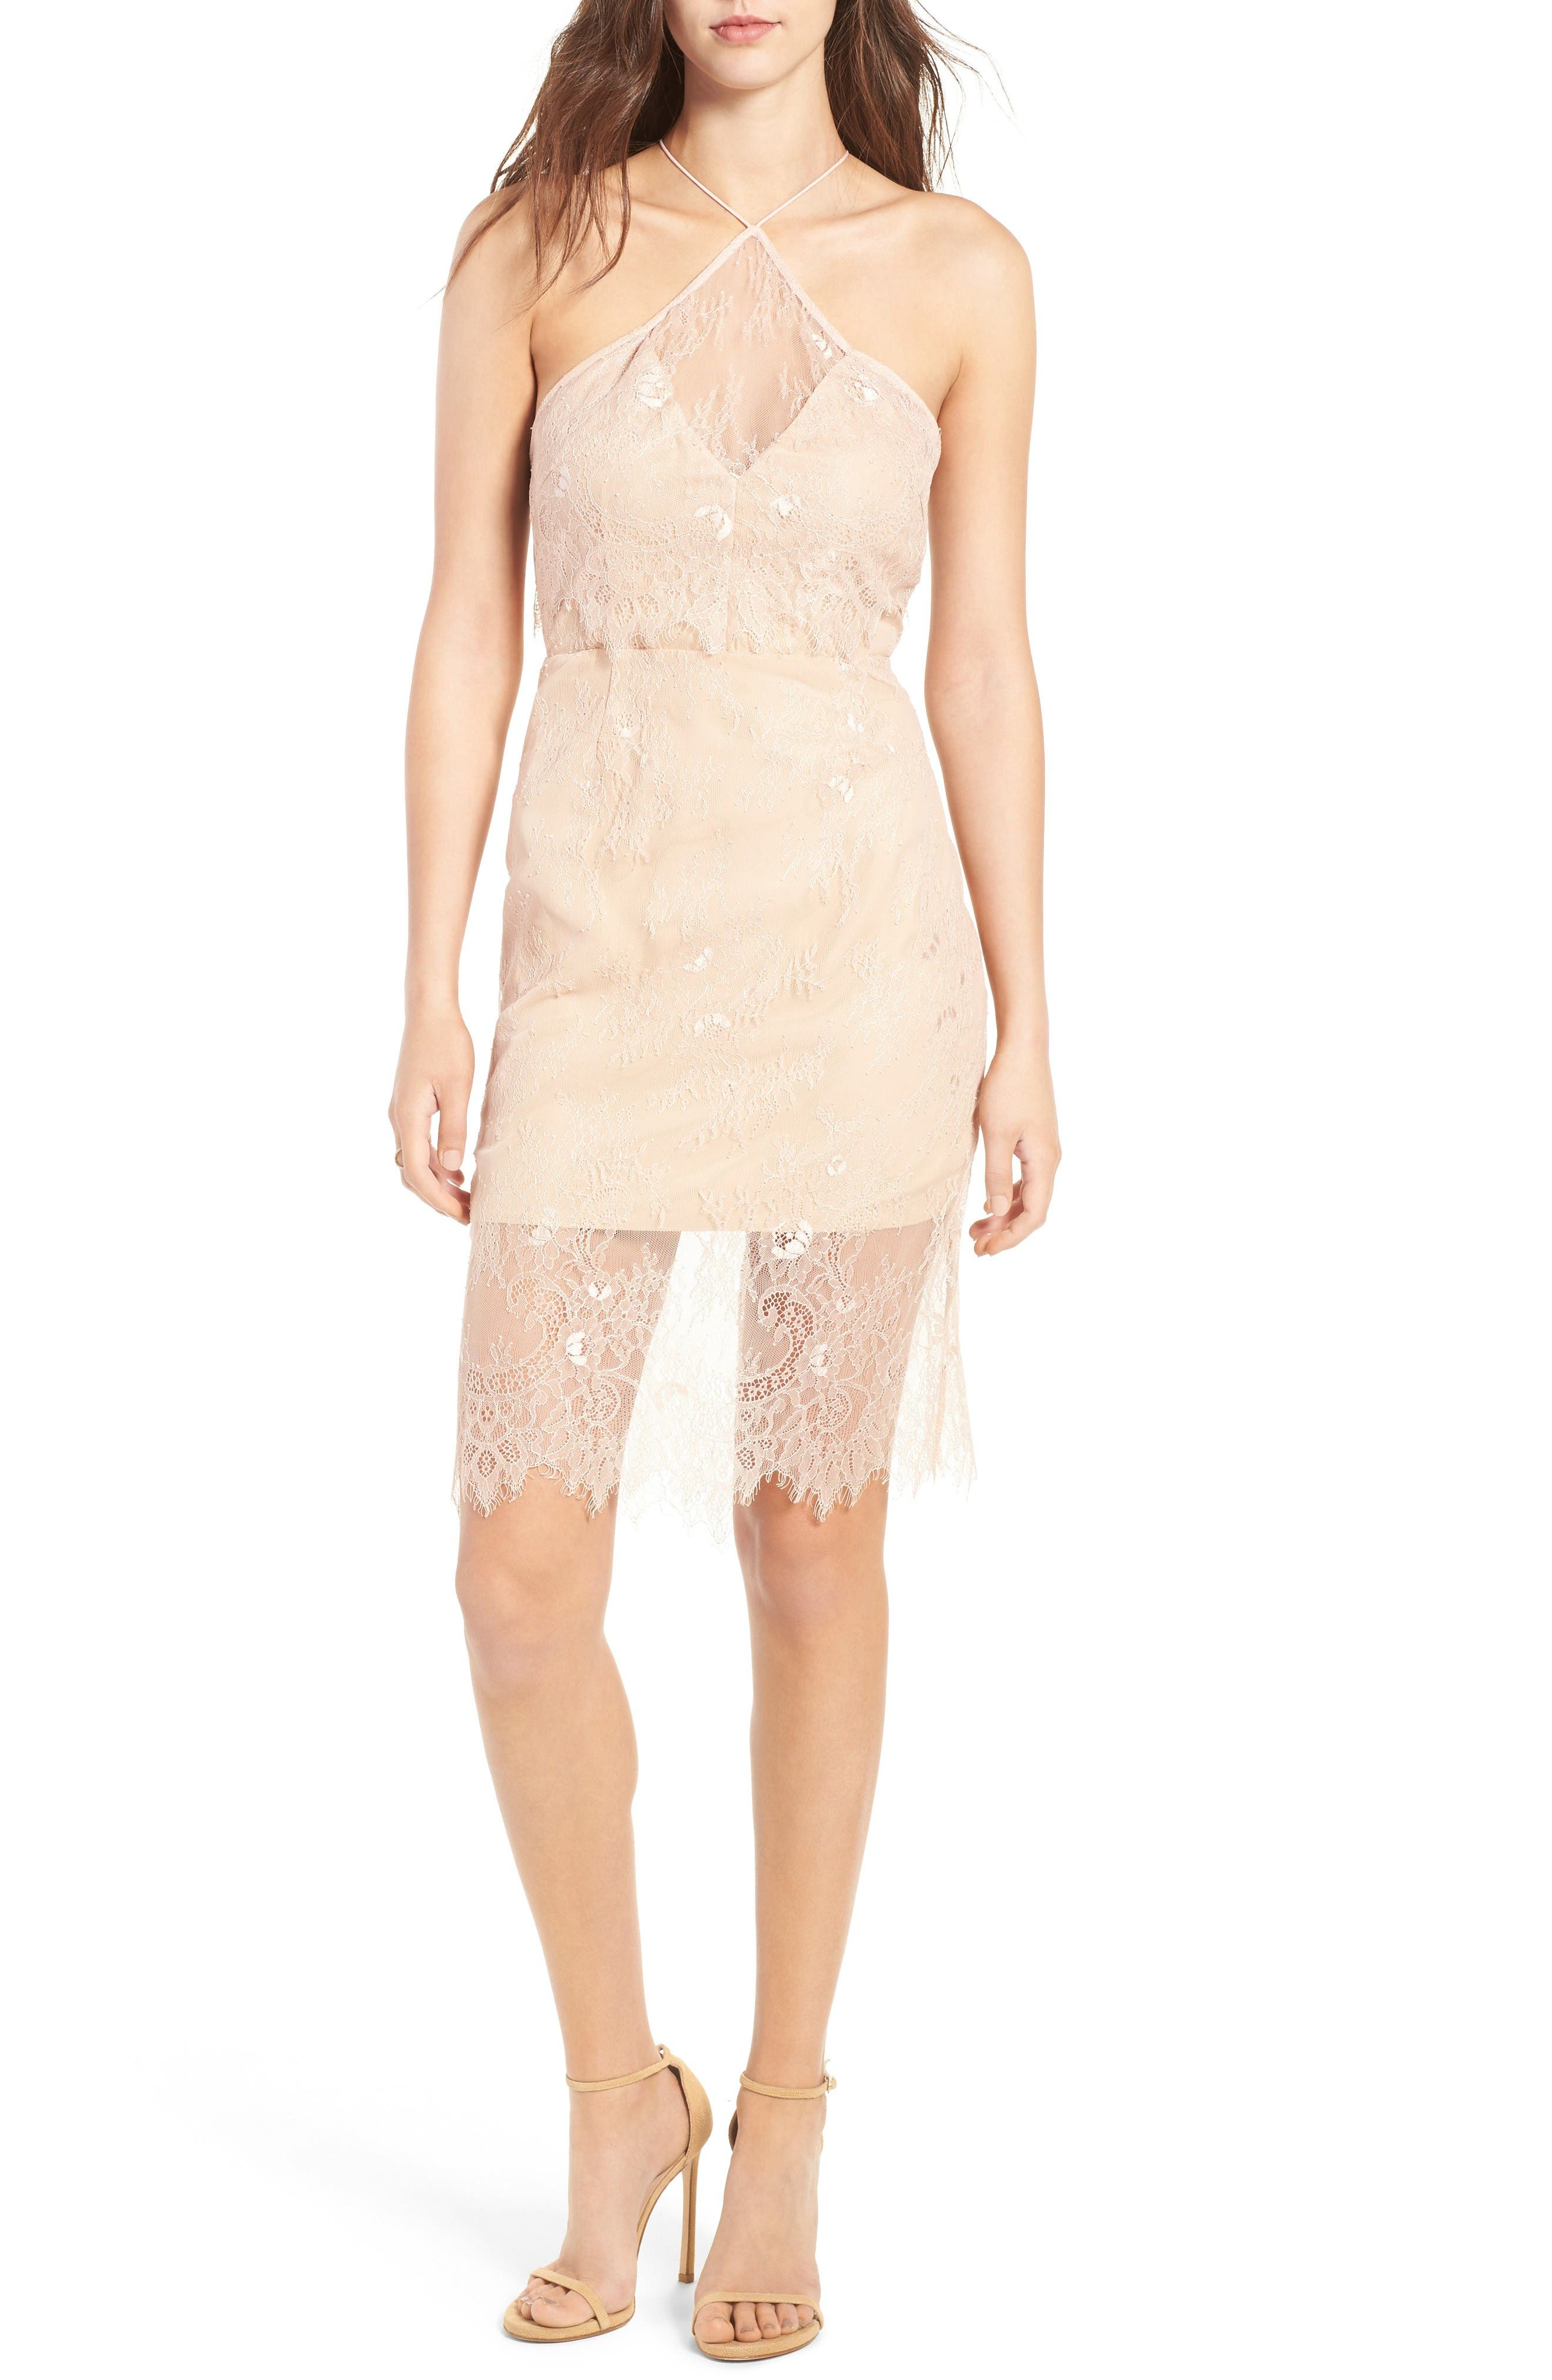 Alternate Image 1 Selected - Keepsake the Label Great Love Lace Dress